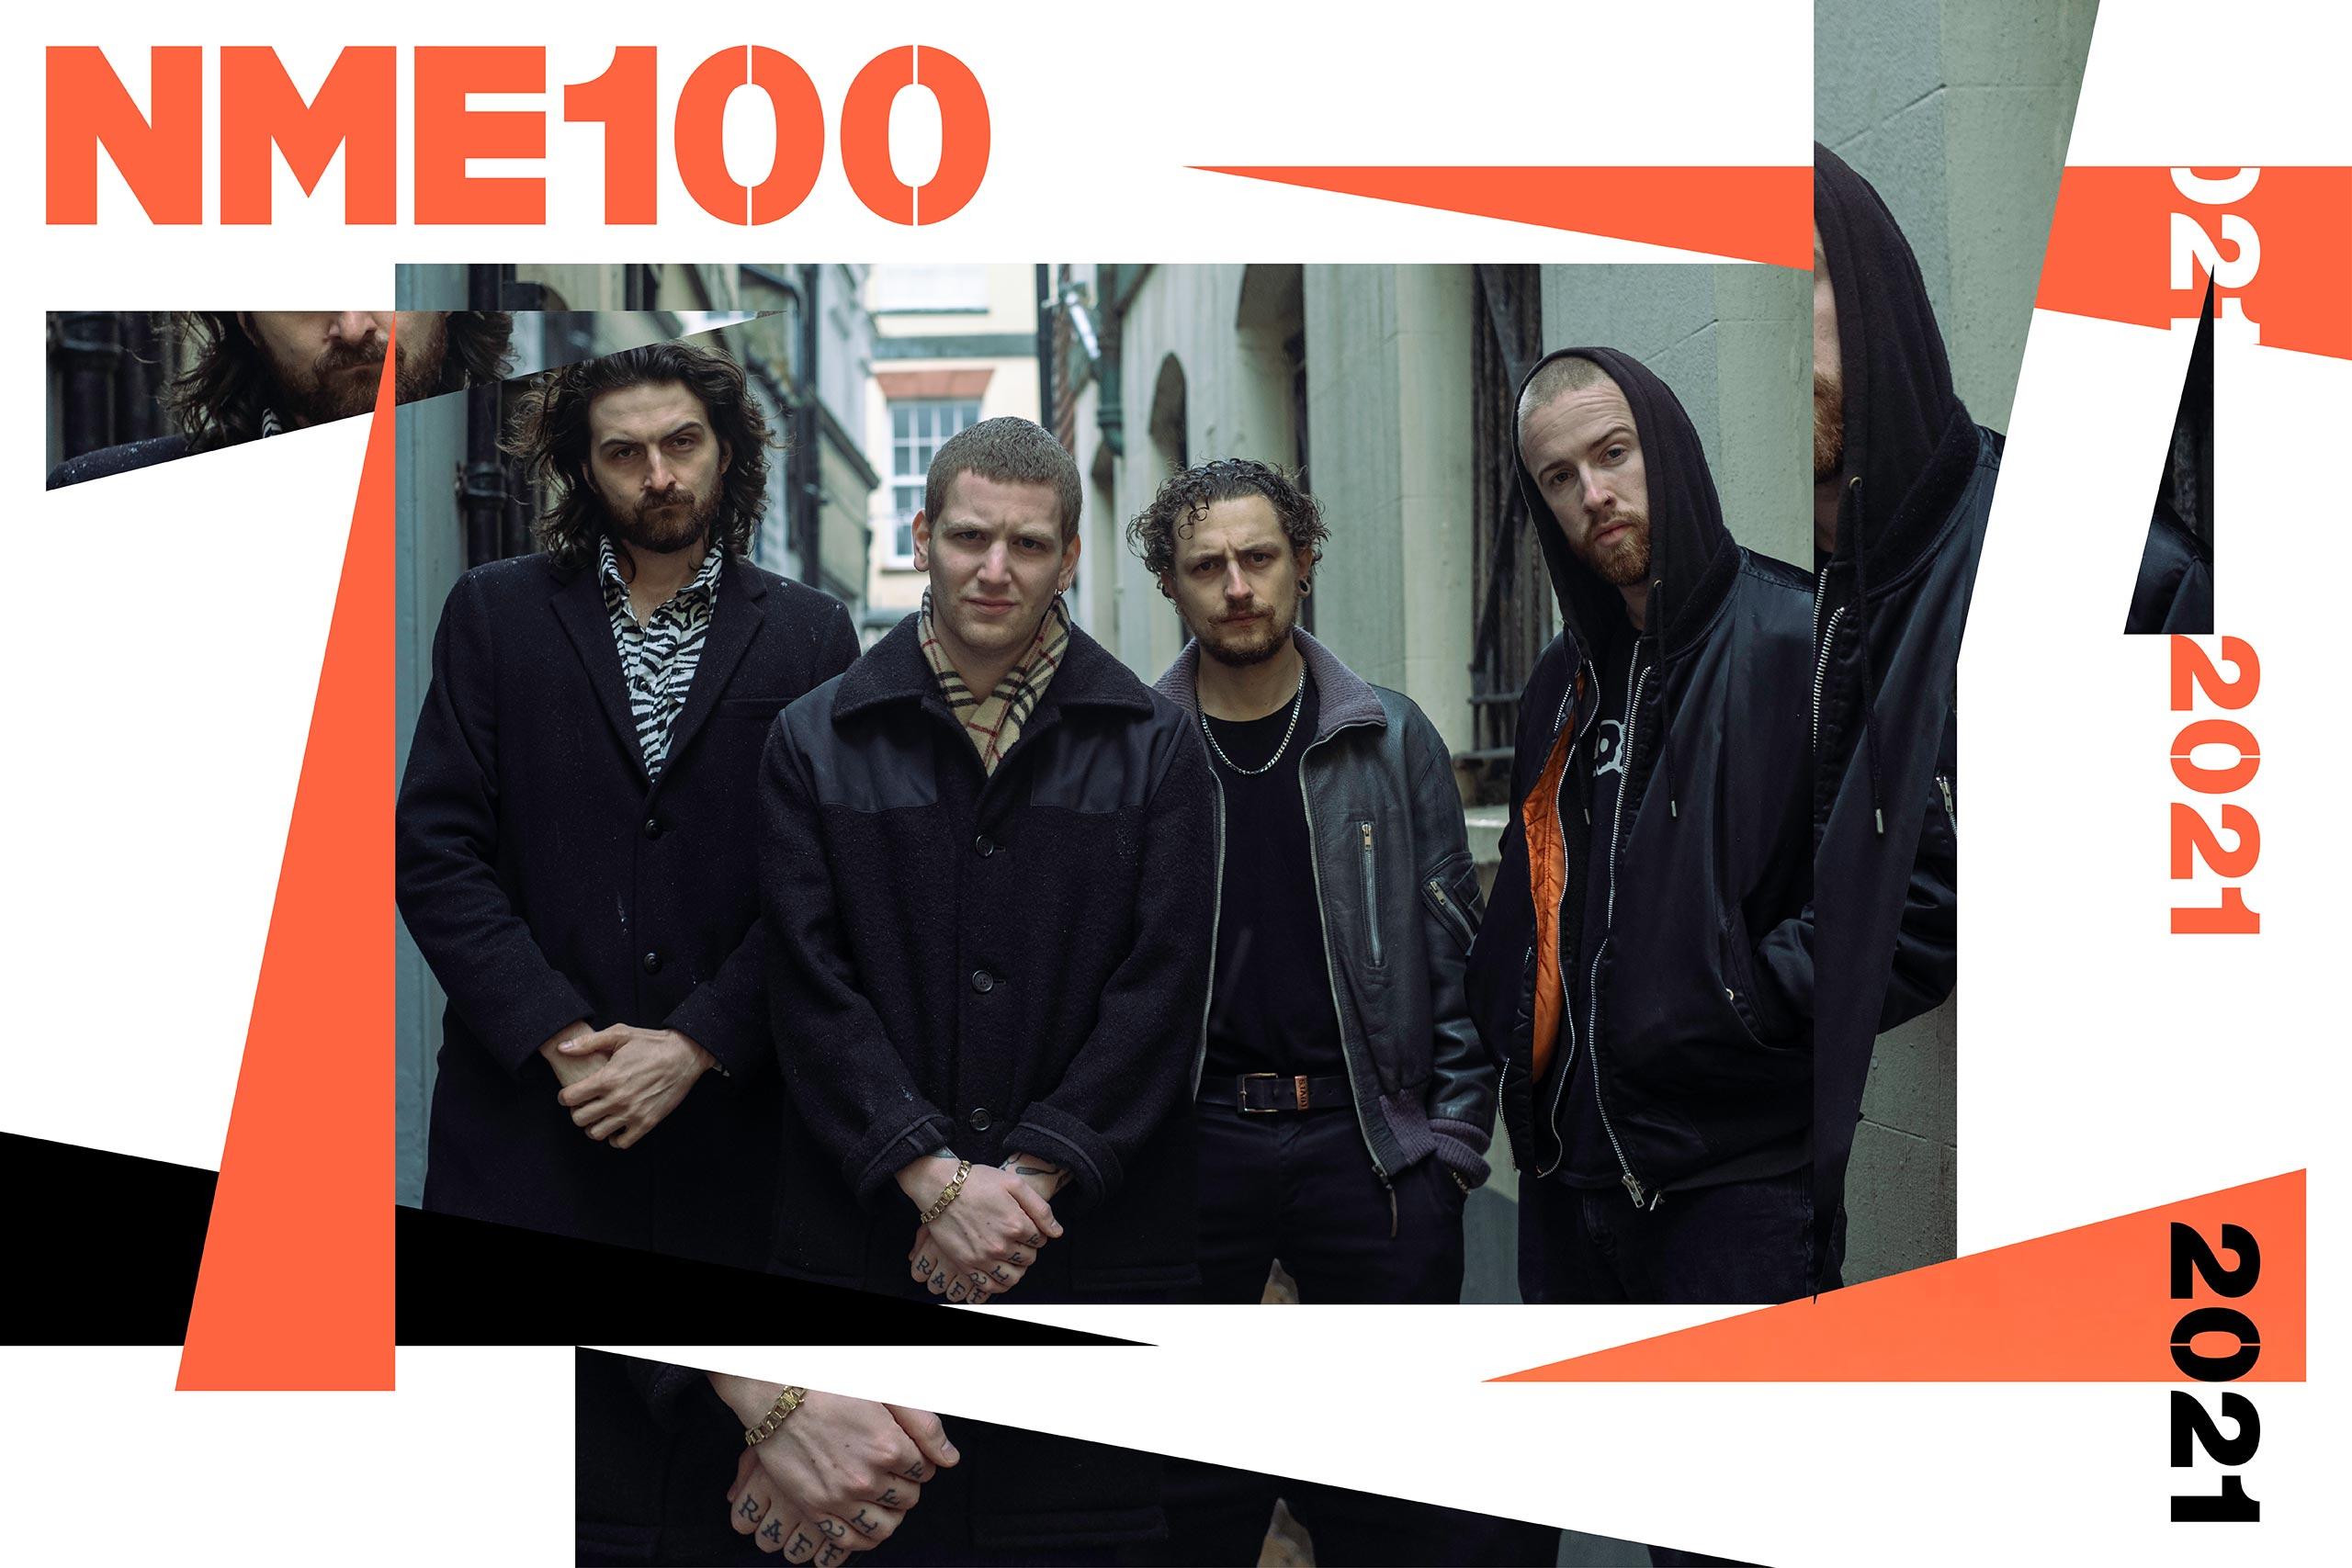 NME 100 kid kapachi